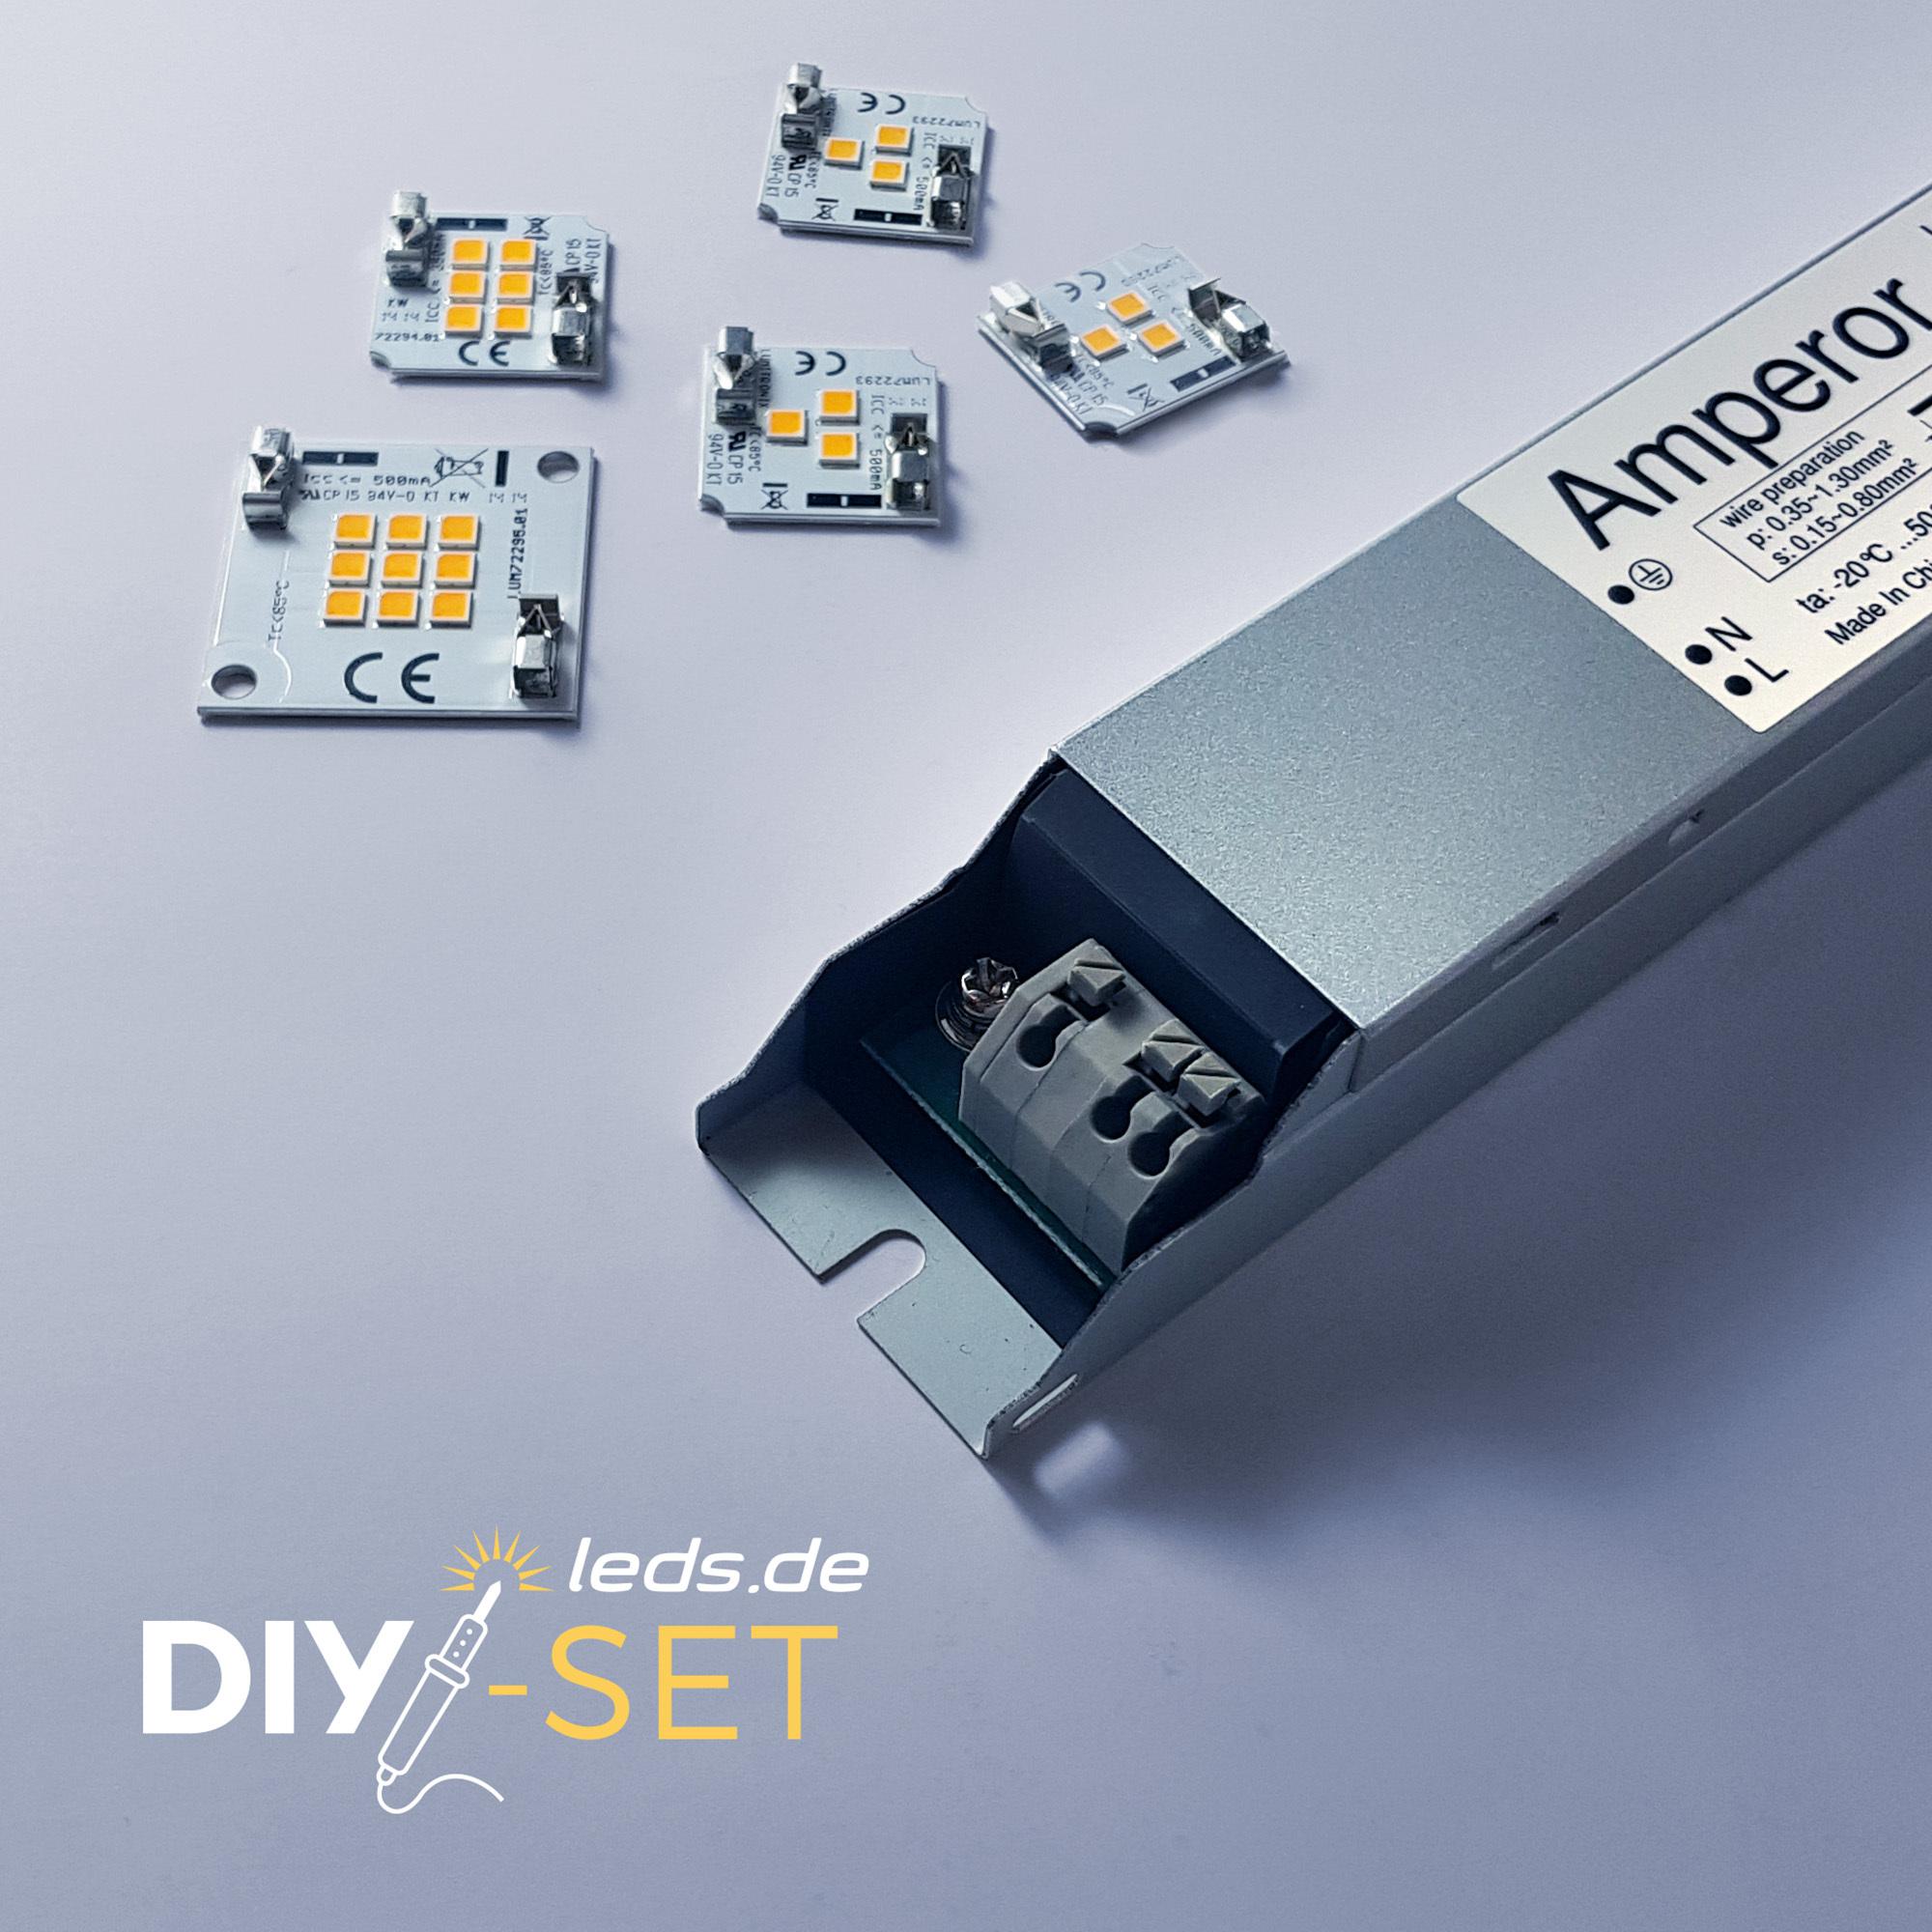 LUMITRONIX SmartArray Q9/Q6/Q3 Bastler-Set DIY-Kit warmweiß 36870